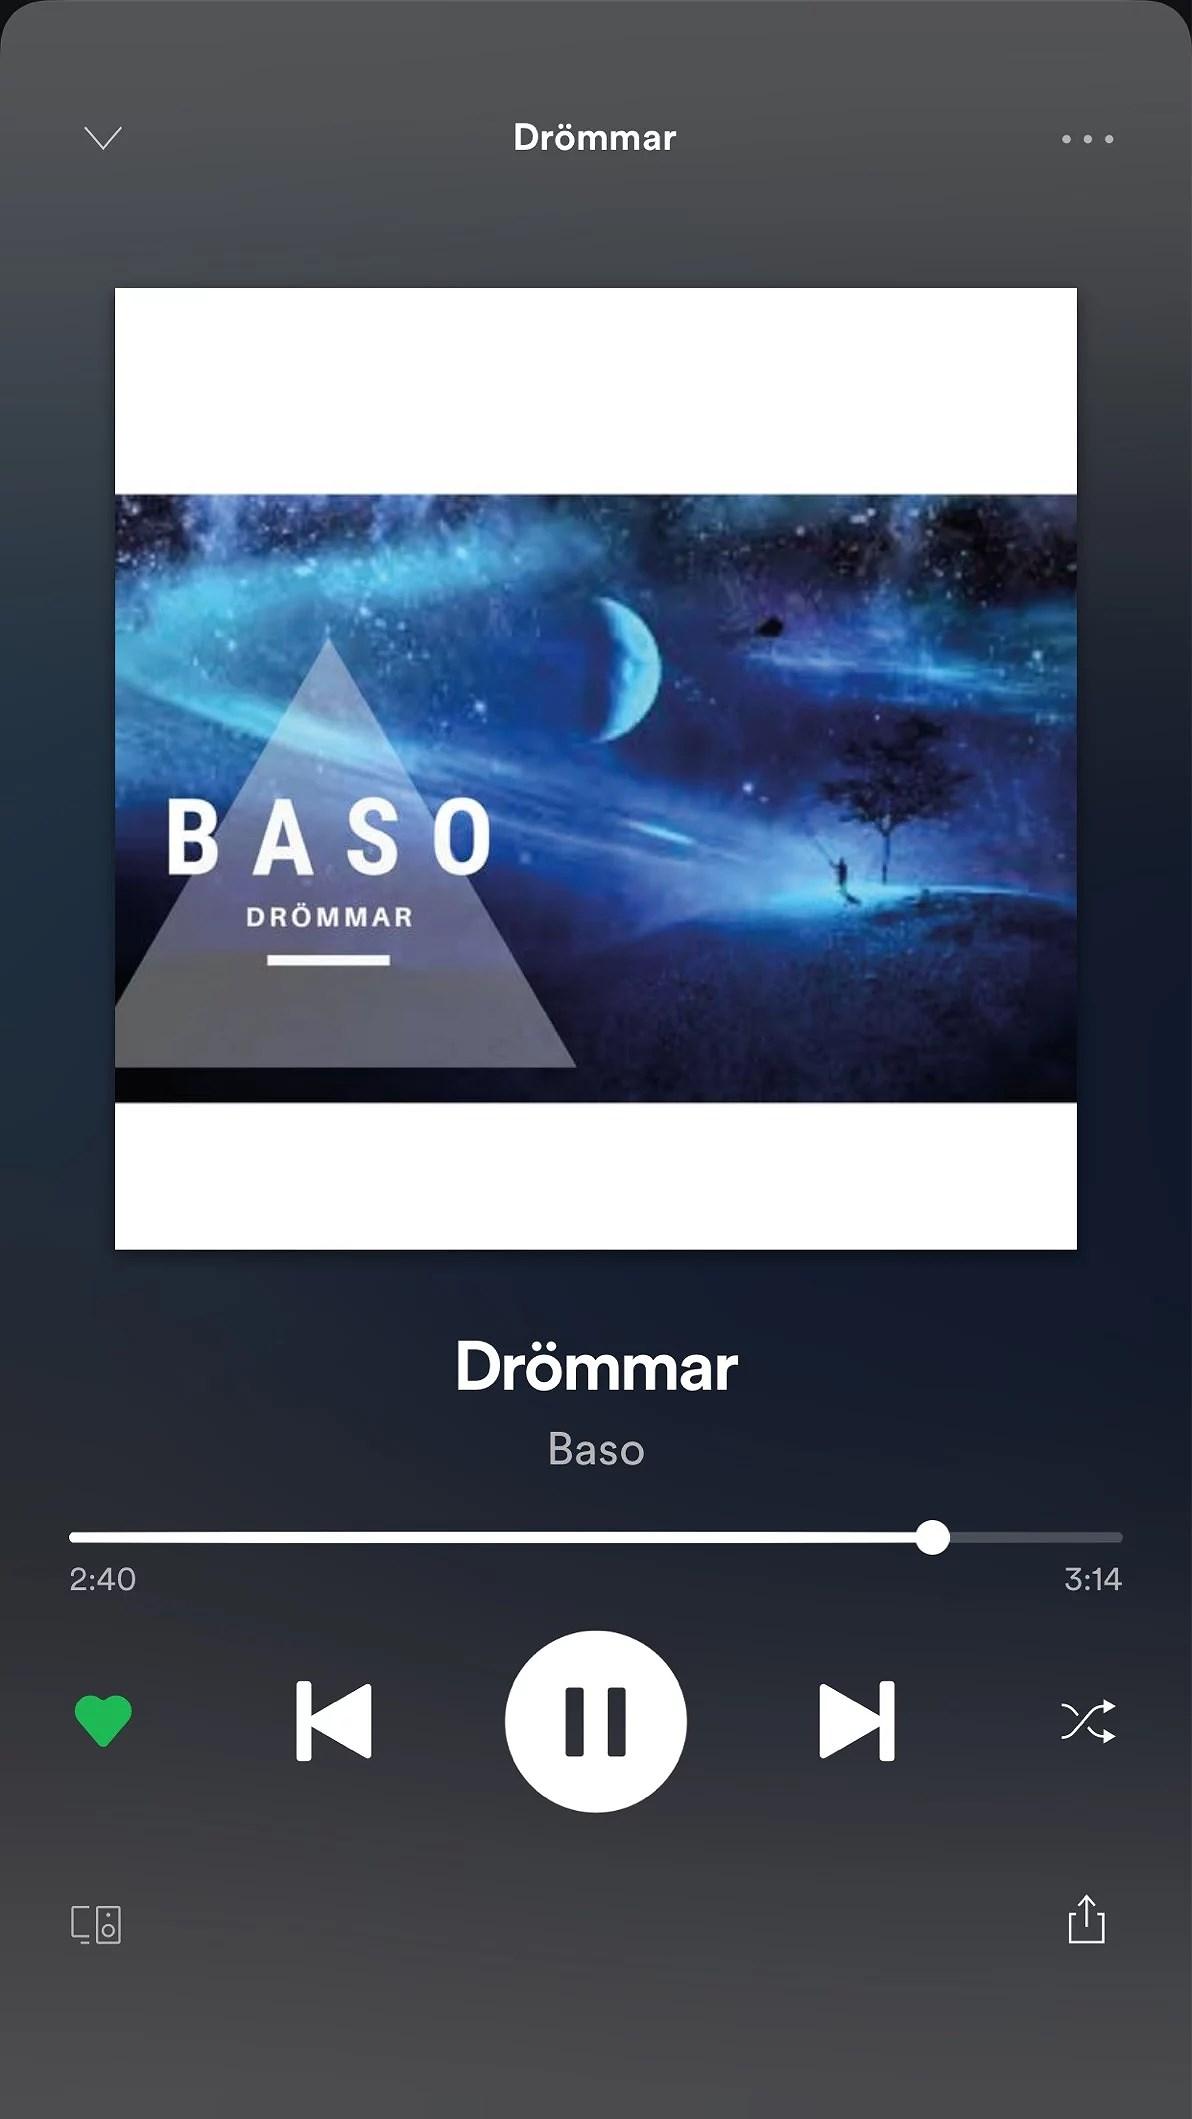 Baso - Drömmar